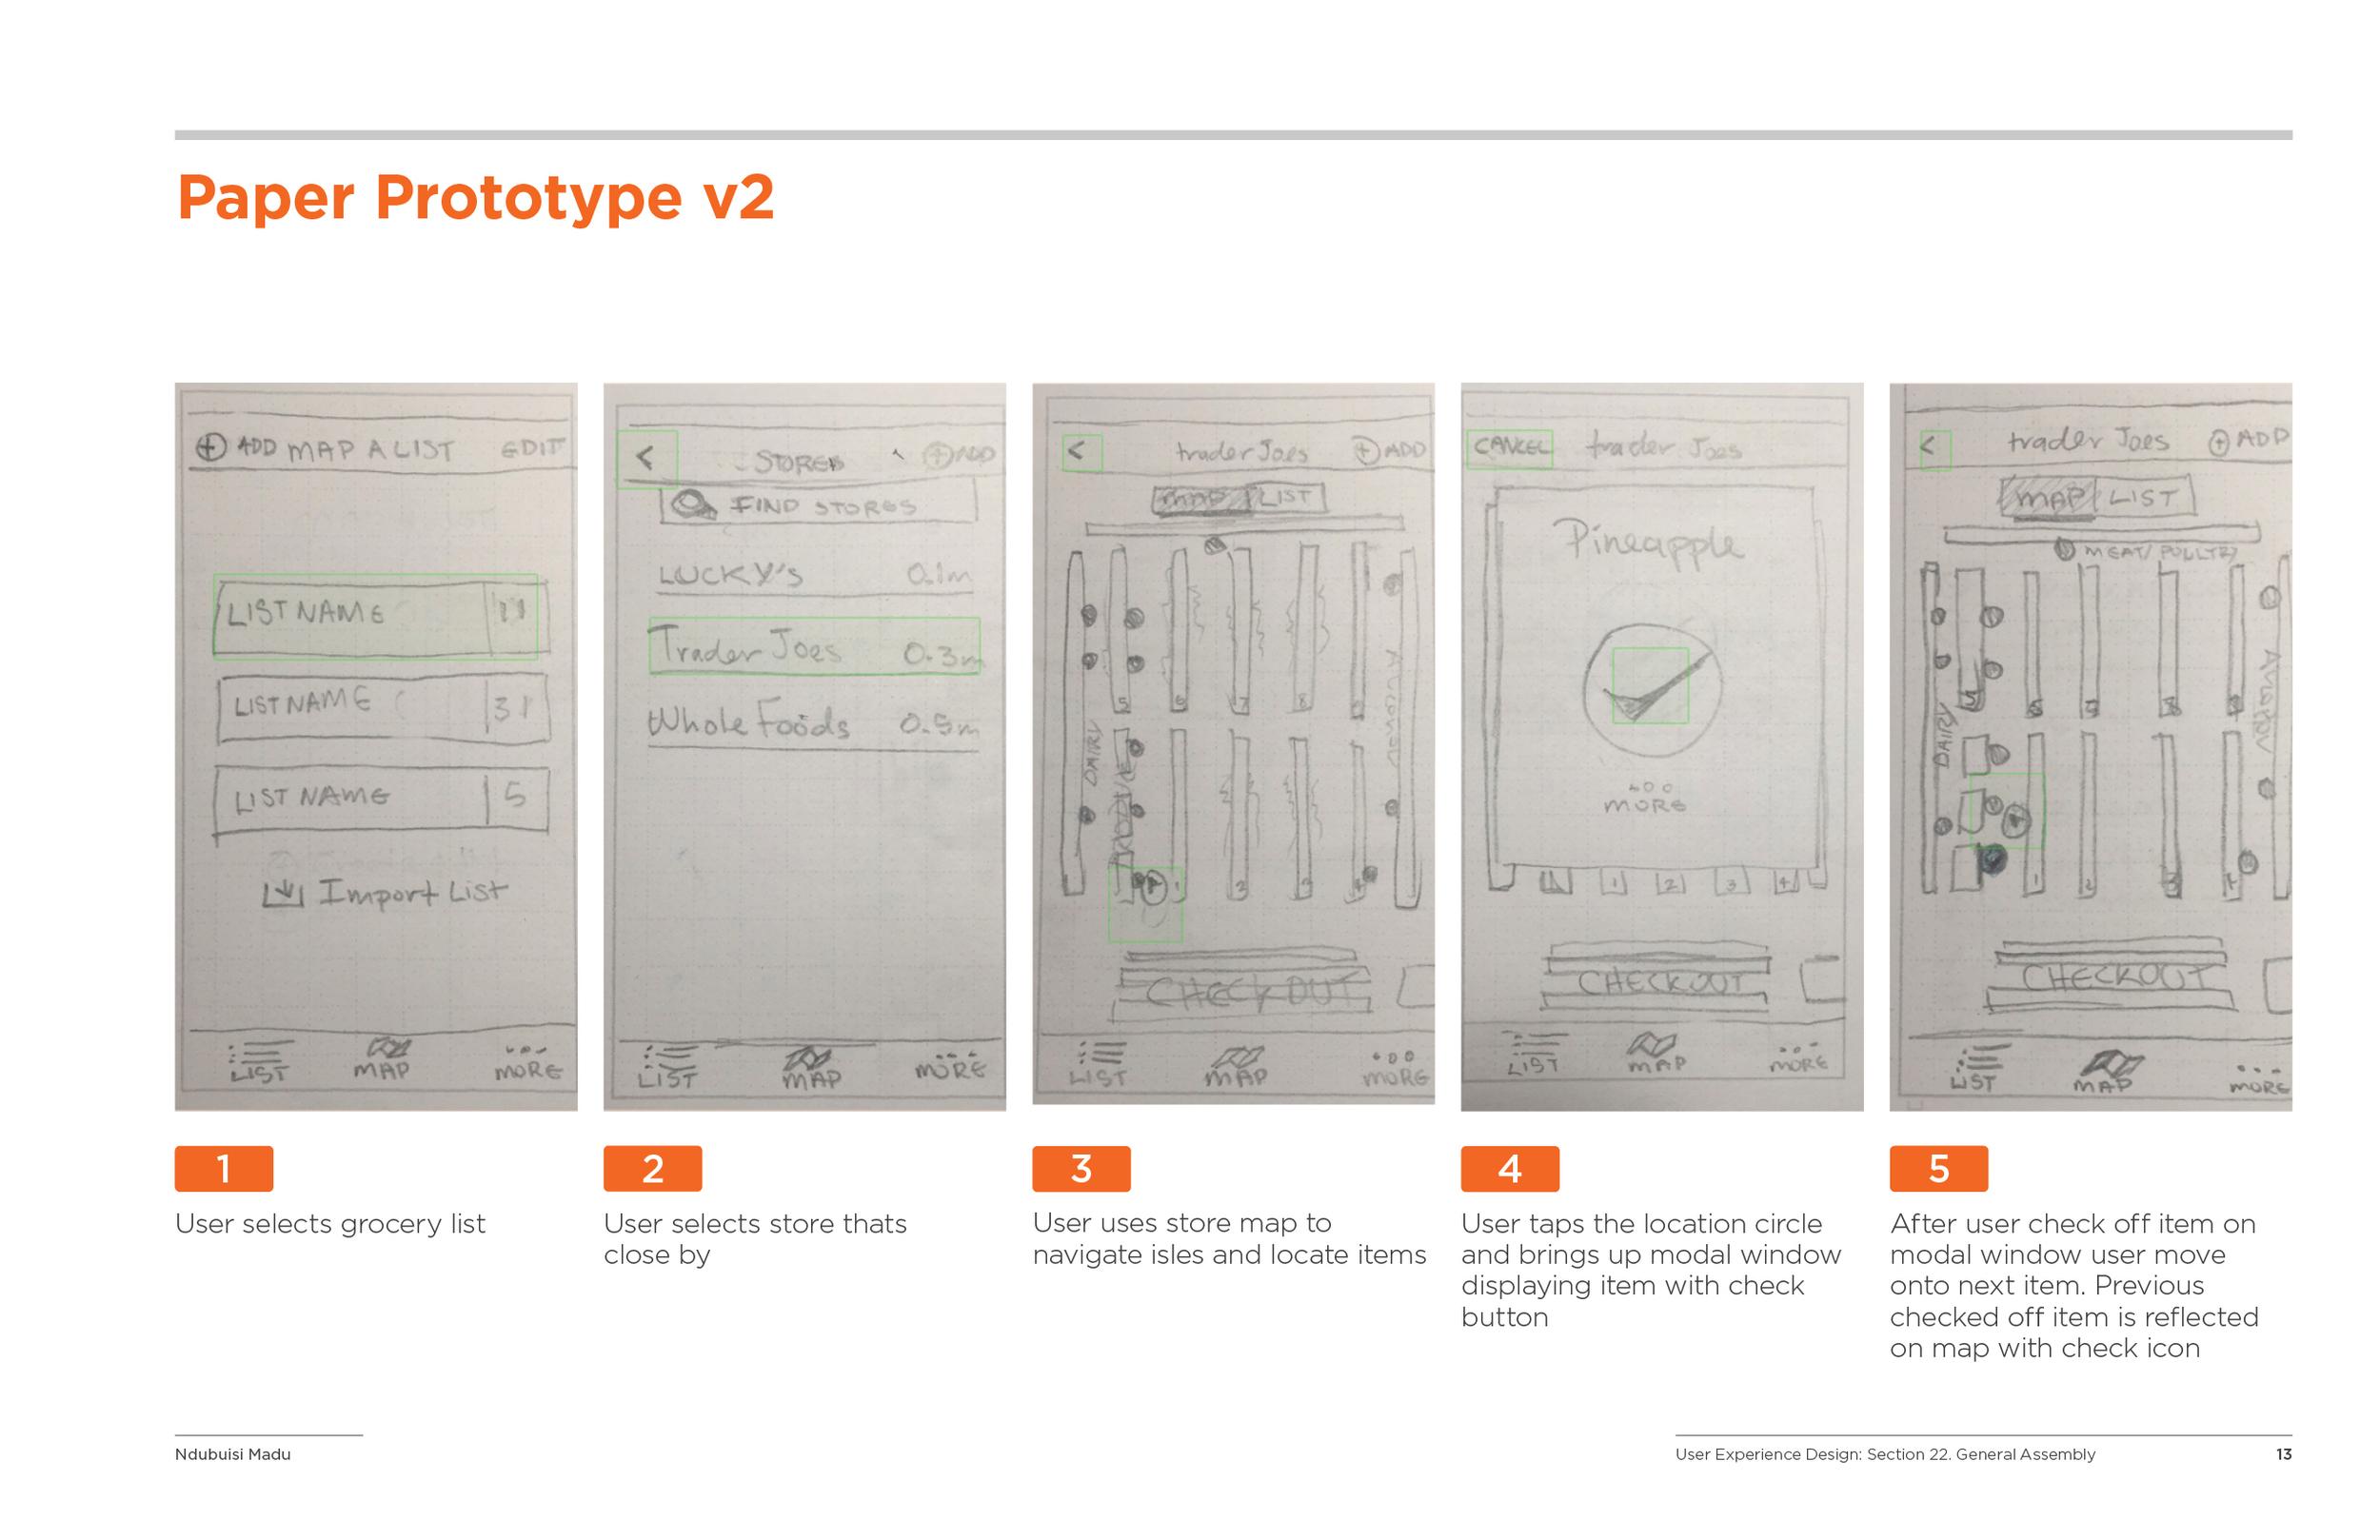 UXD22_NduMadu_Final_Presentation_Splash13.jpg